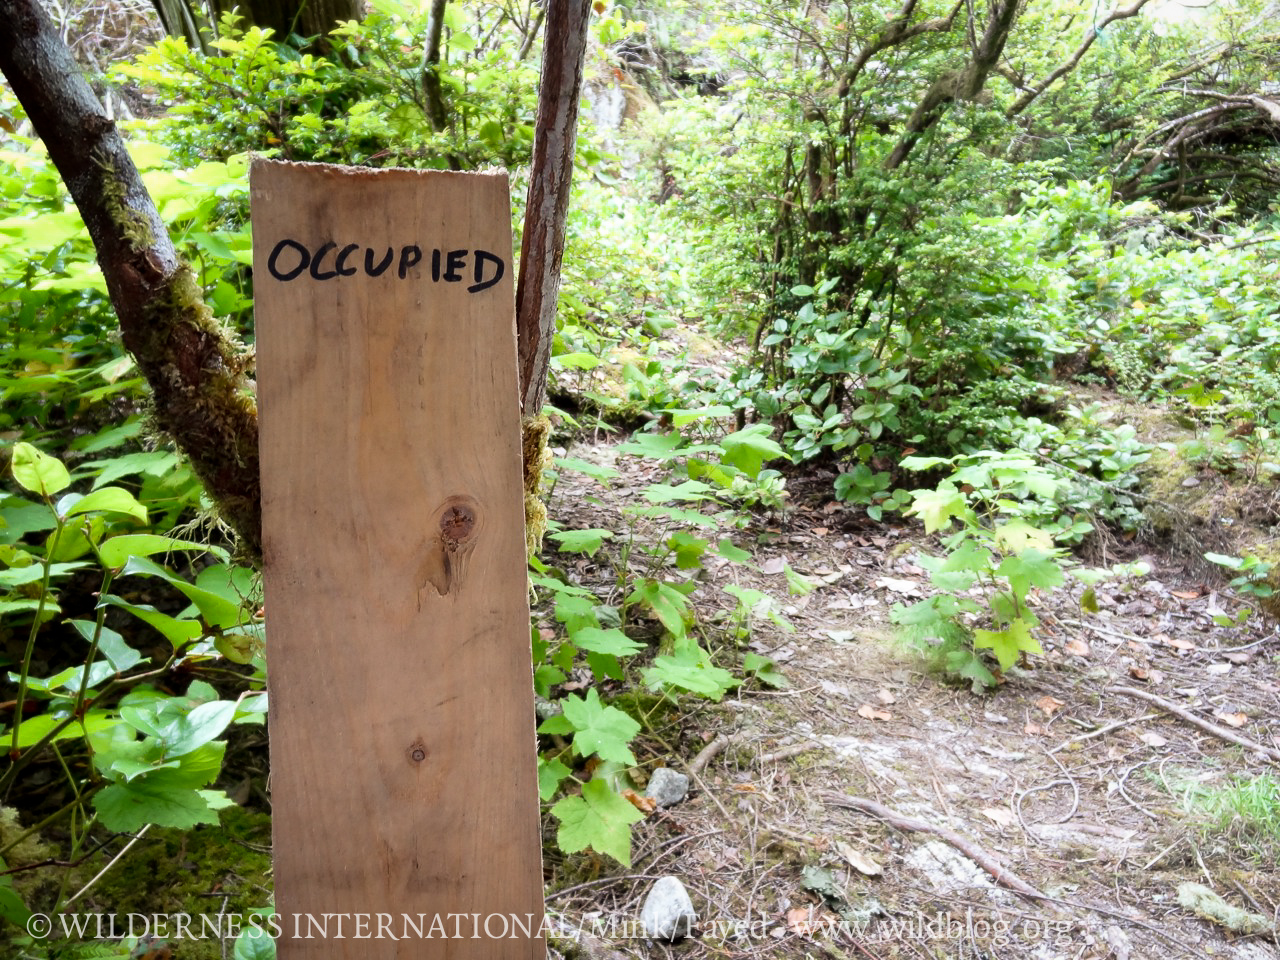 http://wi.wildblog.org/wp-content/uploads/2012/07/lr-09127.jpg